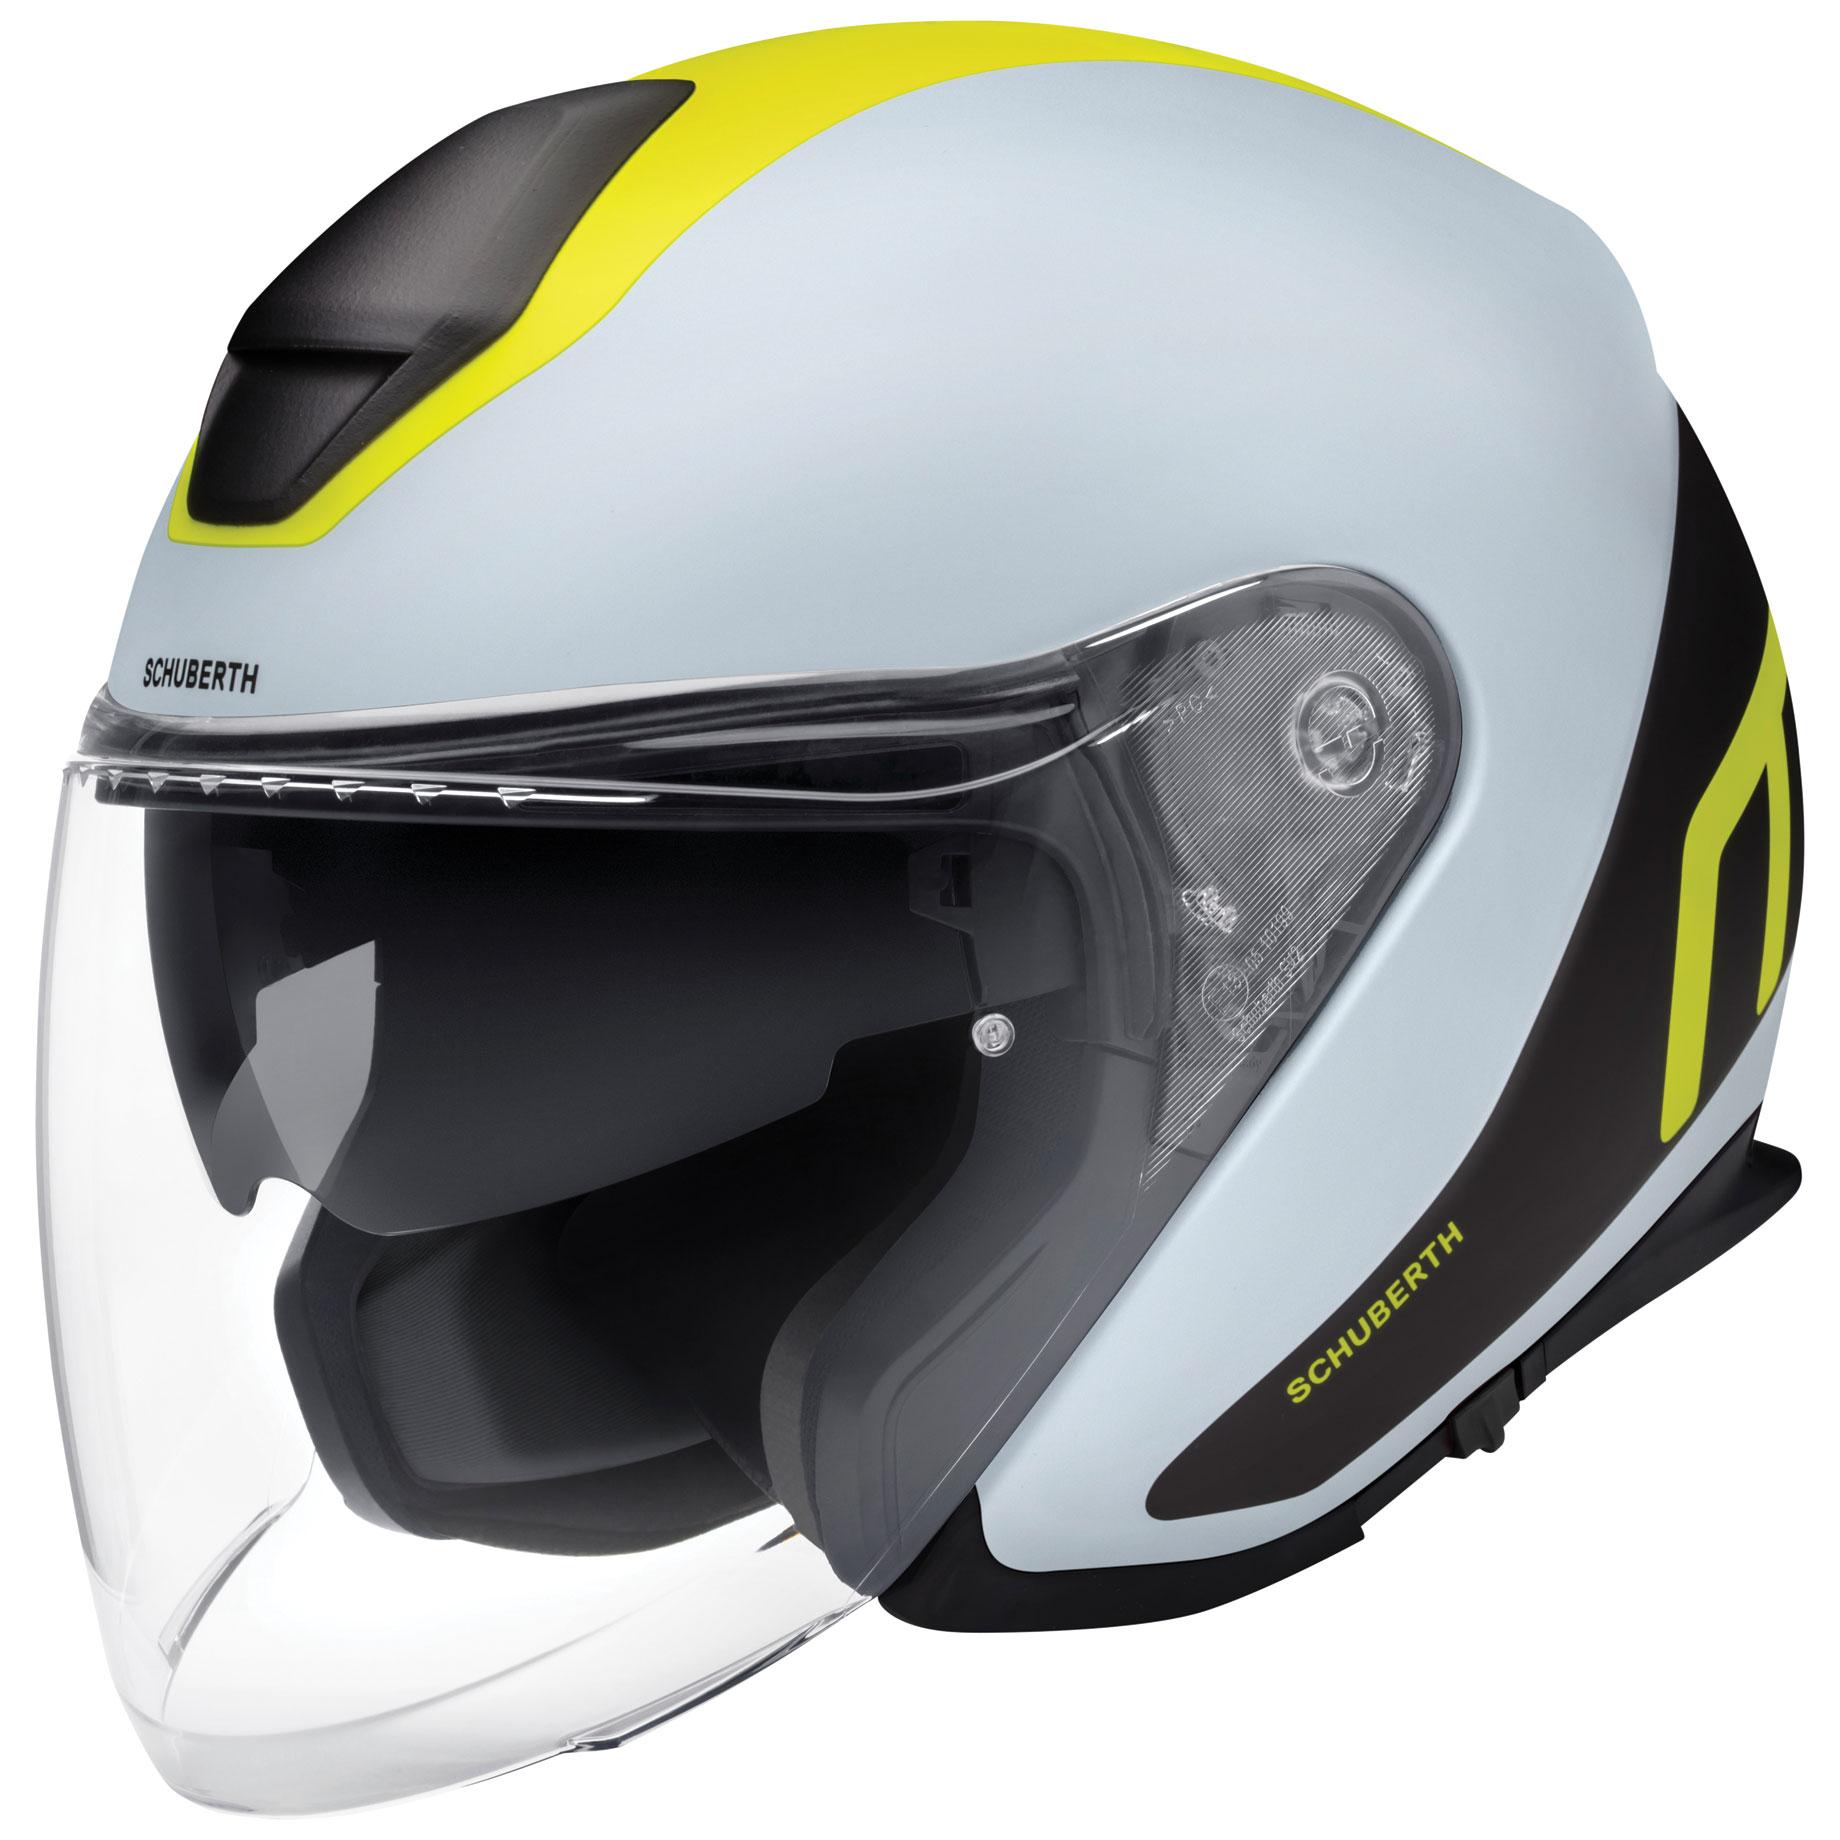 9914b89d Schuberth M1 Pro Triple Yellow Open Face Helmet - 4759243360 ...